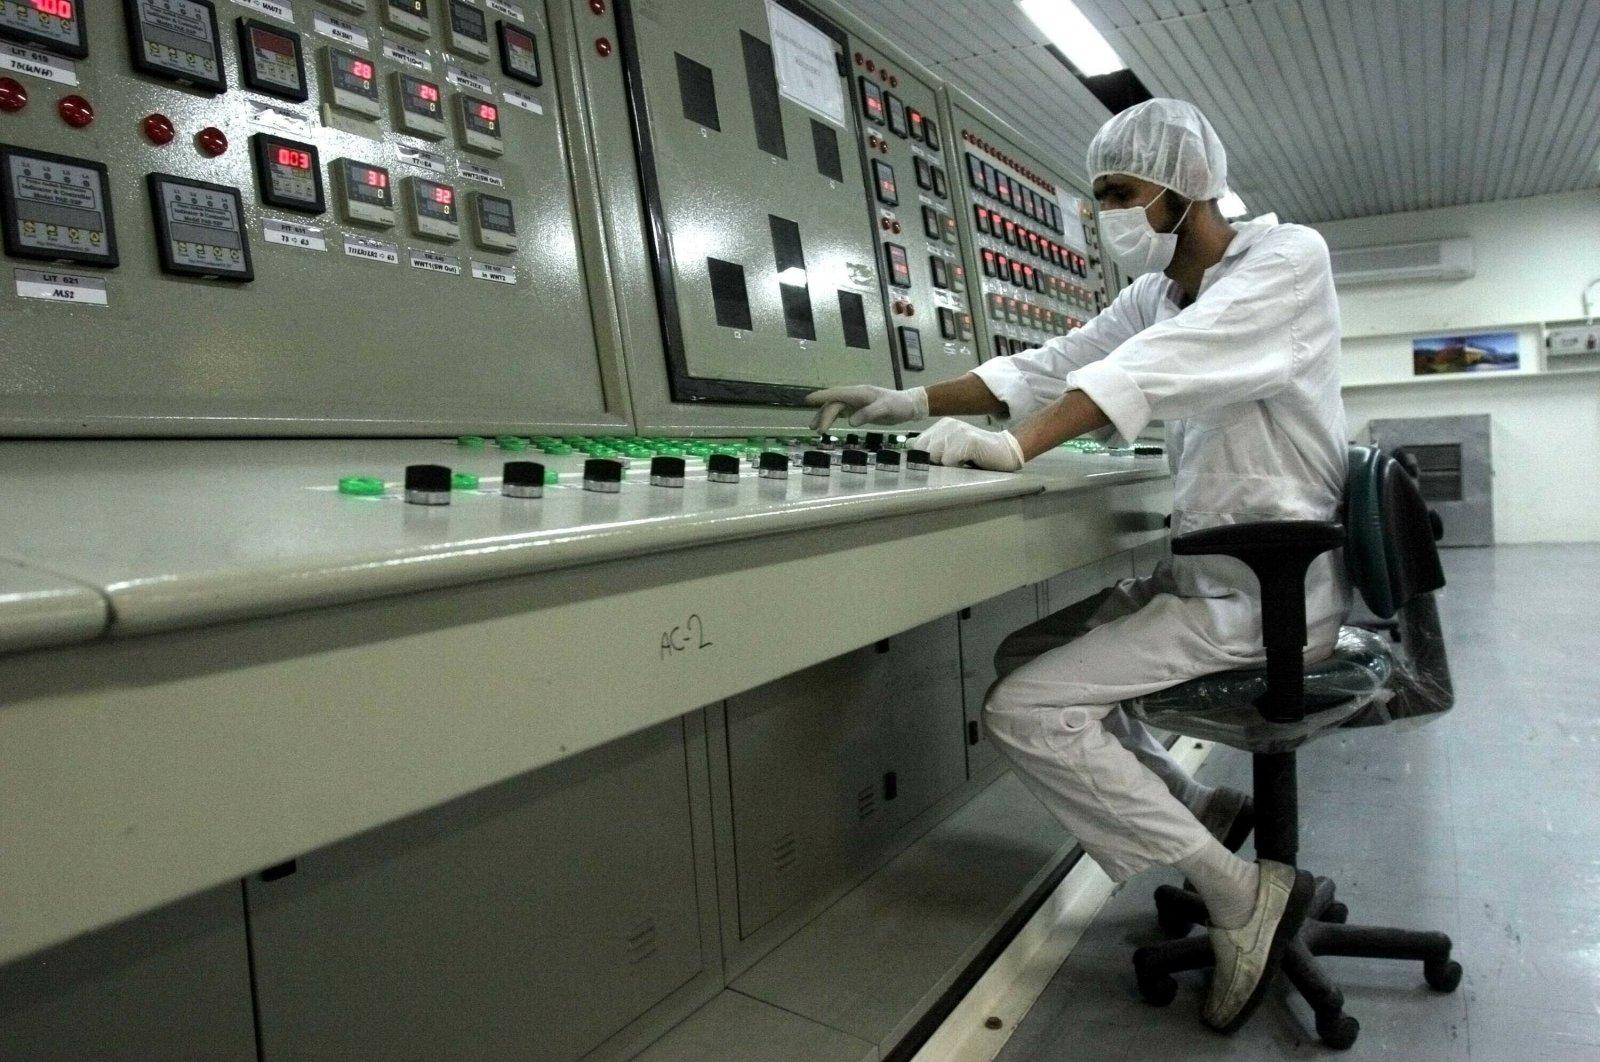 Iranian technician works at the Uranium Conversion Facility just outside the city of Isfahan, Iran, 255 miles (410 kilometers) south of the capital Tehran, Feb. 3, 2007. (AP Photo)